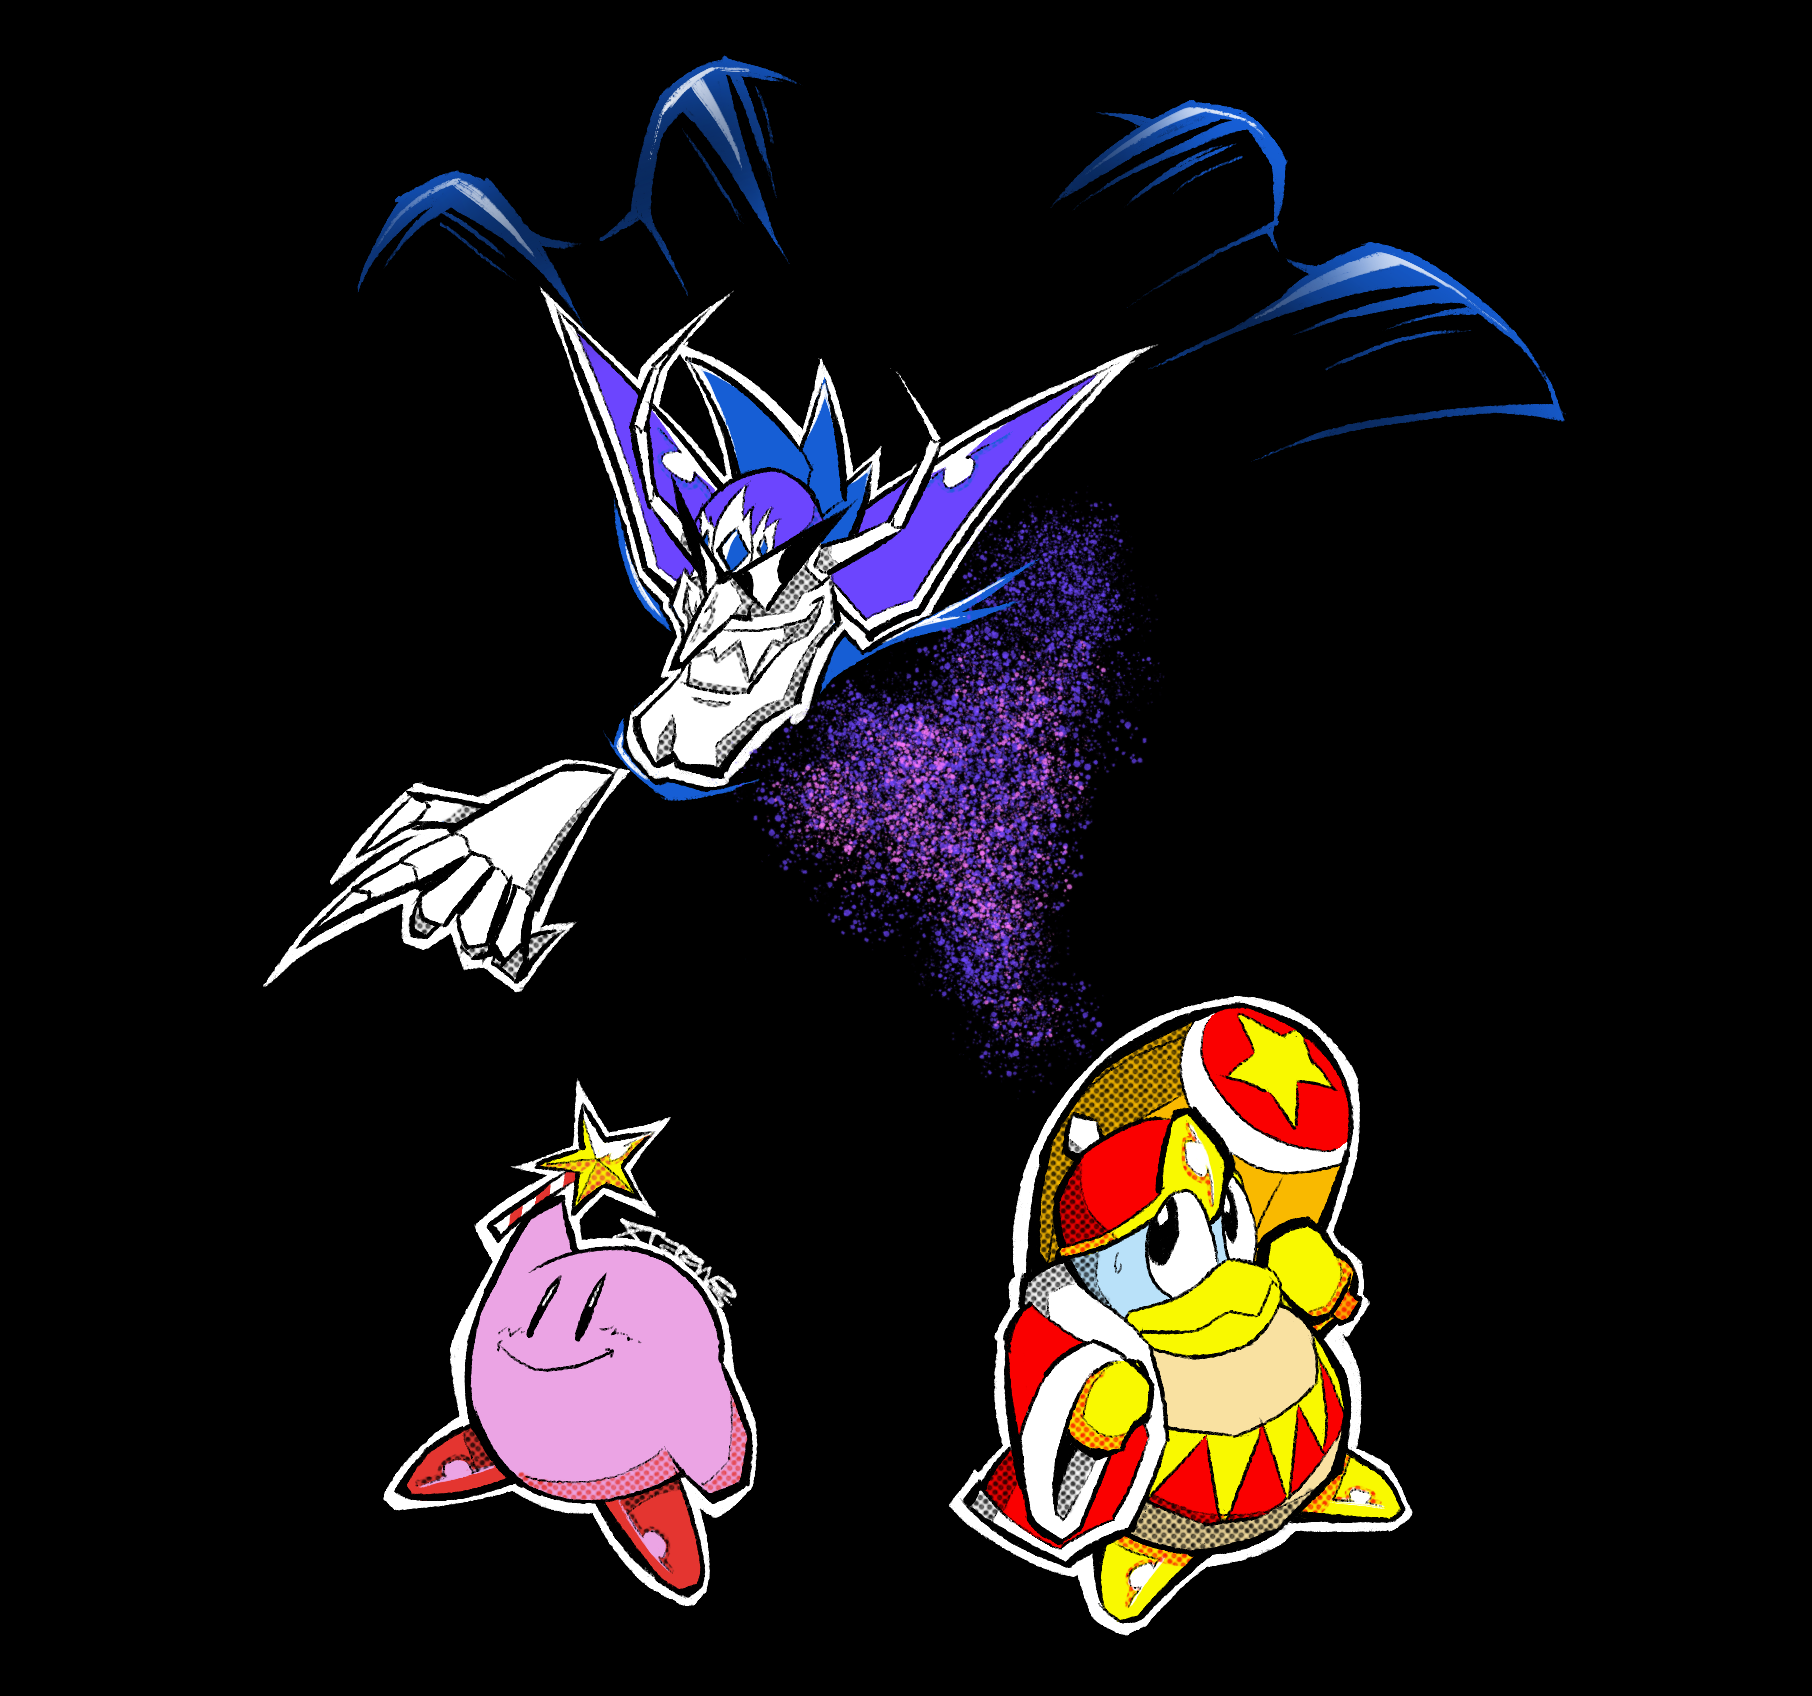 Kirby Daydreams in Nightmareland